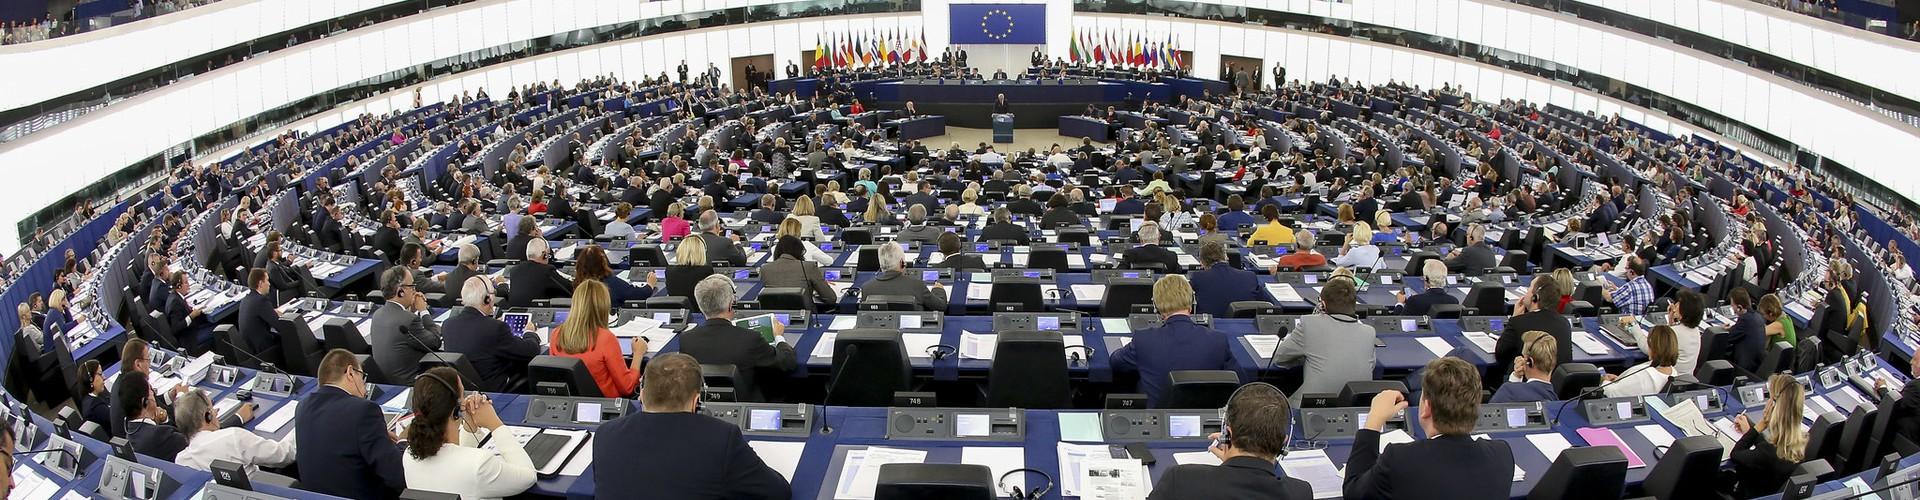 State of the Union (Credit: European Union 2015 - European Parliament via Flickr)